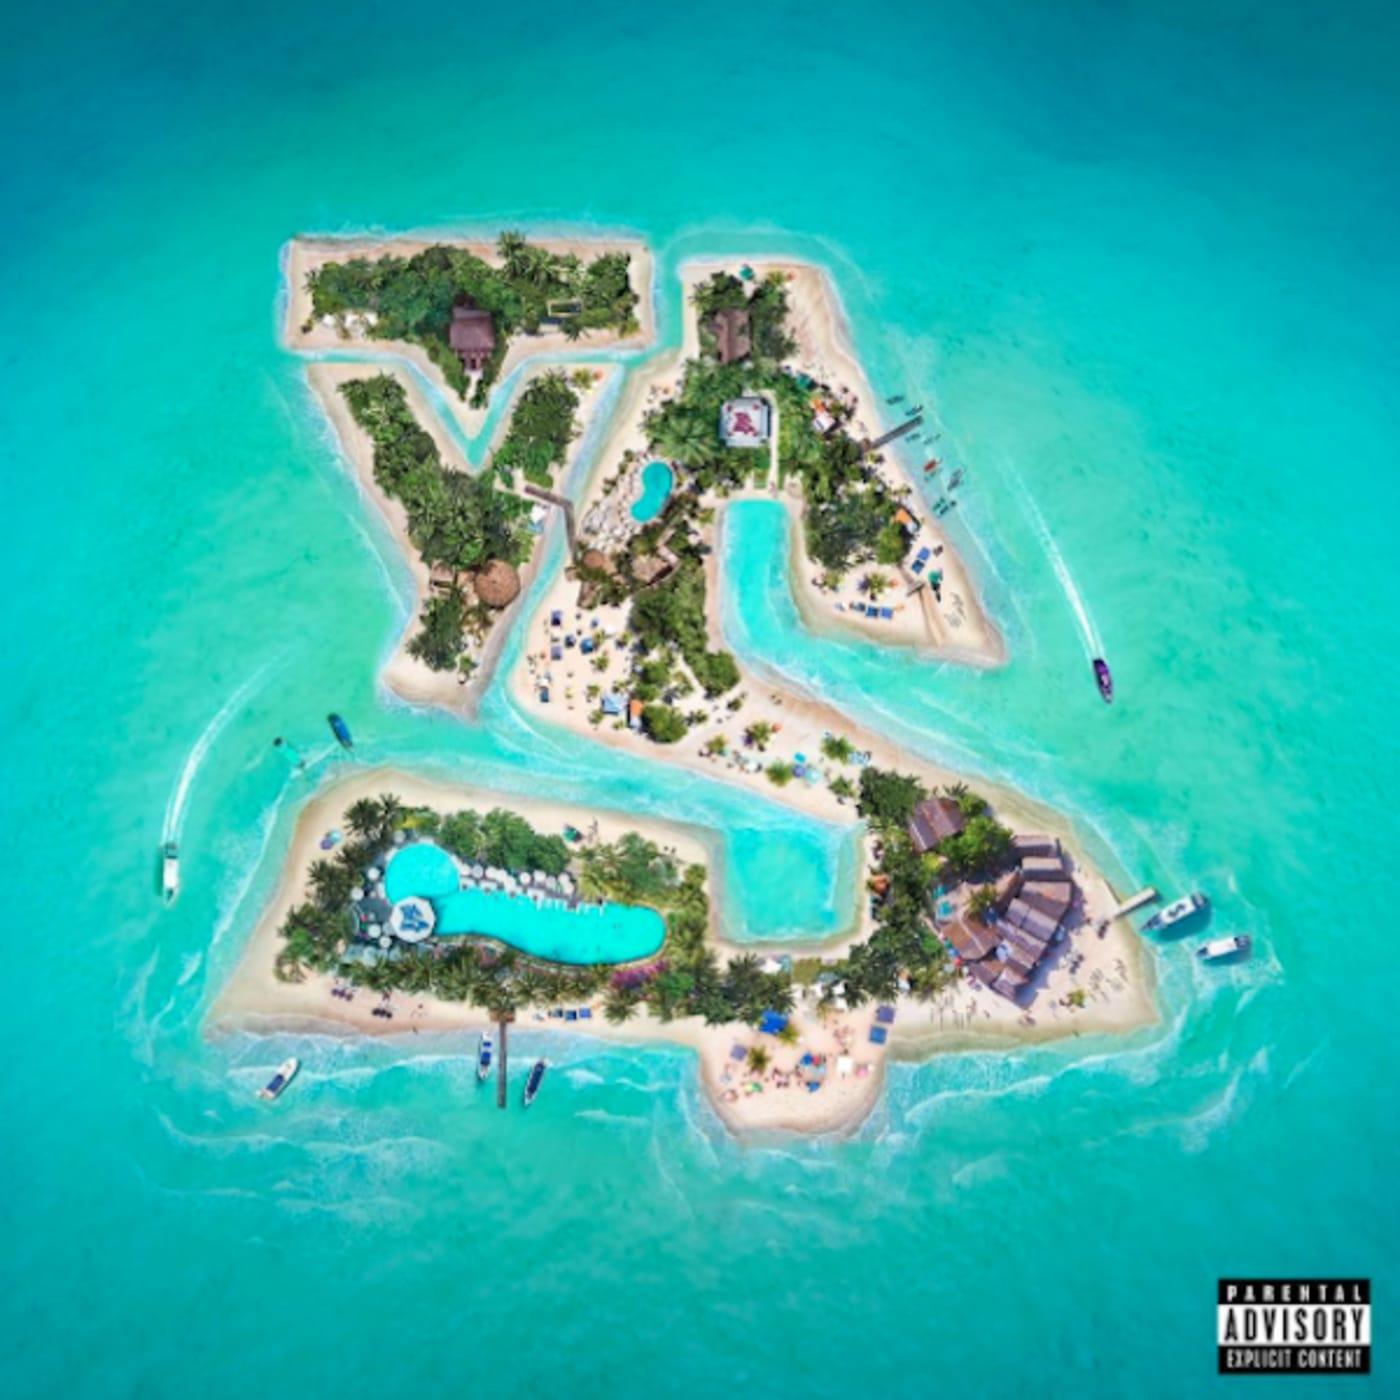 Beach House 3 album cover.